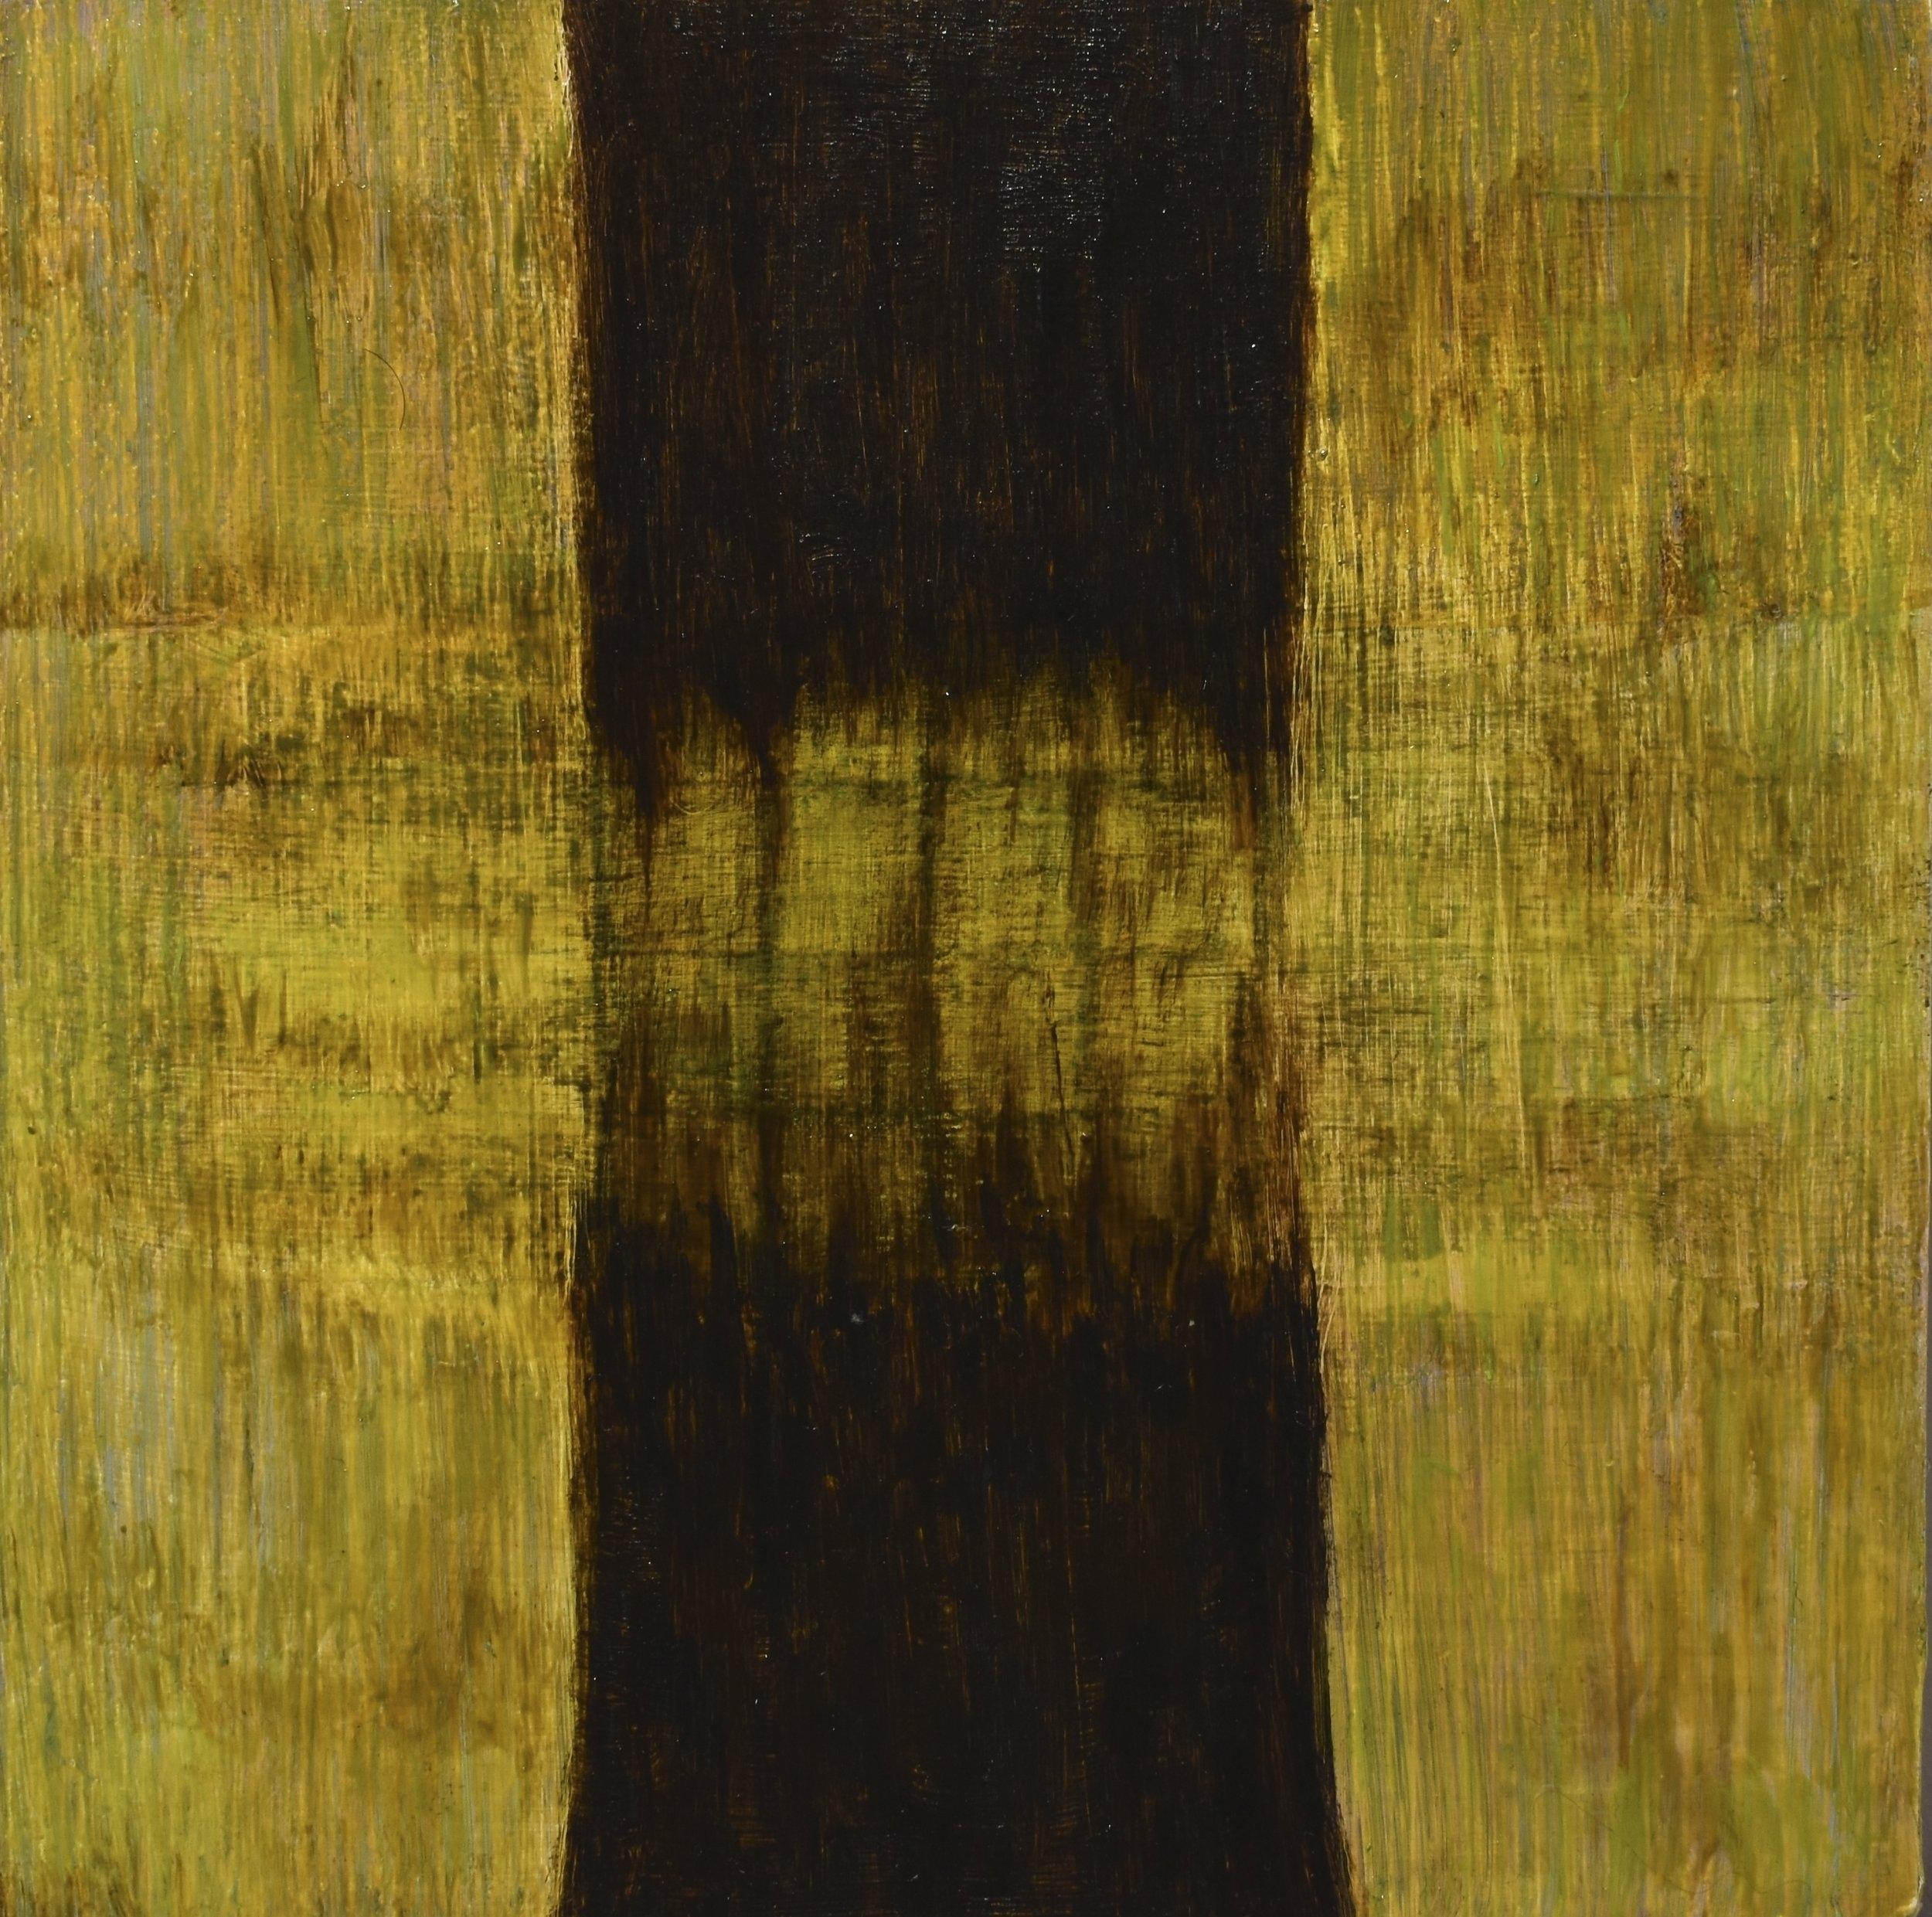 splinter, 2017 oil on wood panel, 12.5 x 12.5 cm